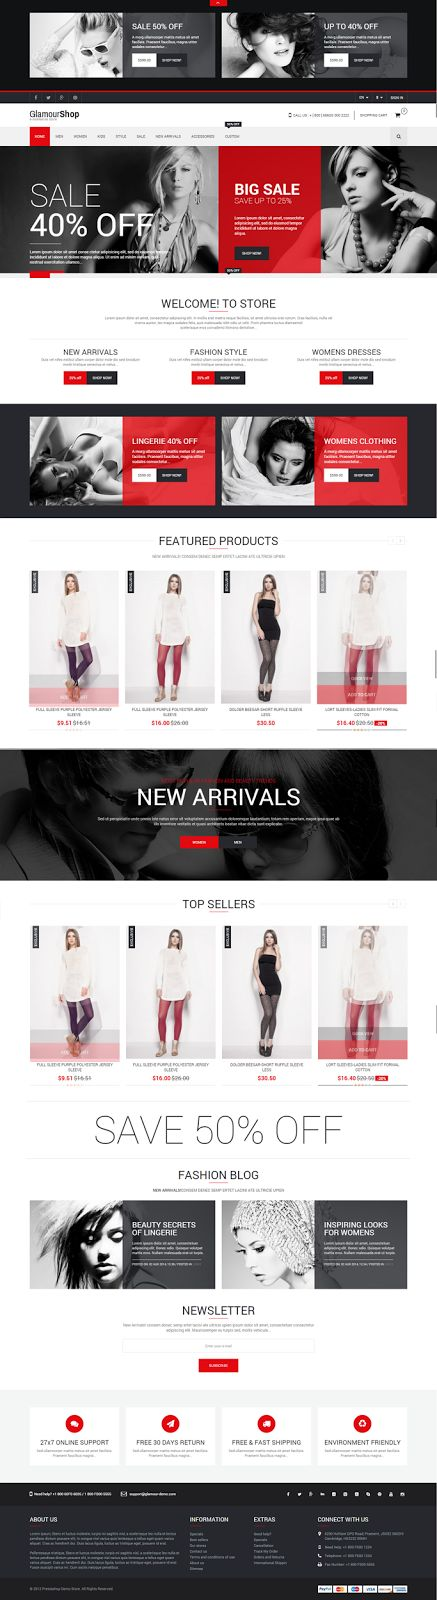 GlamourShop Responsive New #Prestashop 1.6 Theme + Blog #website #fashion #store #shop